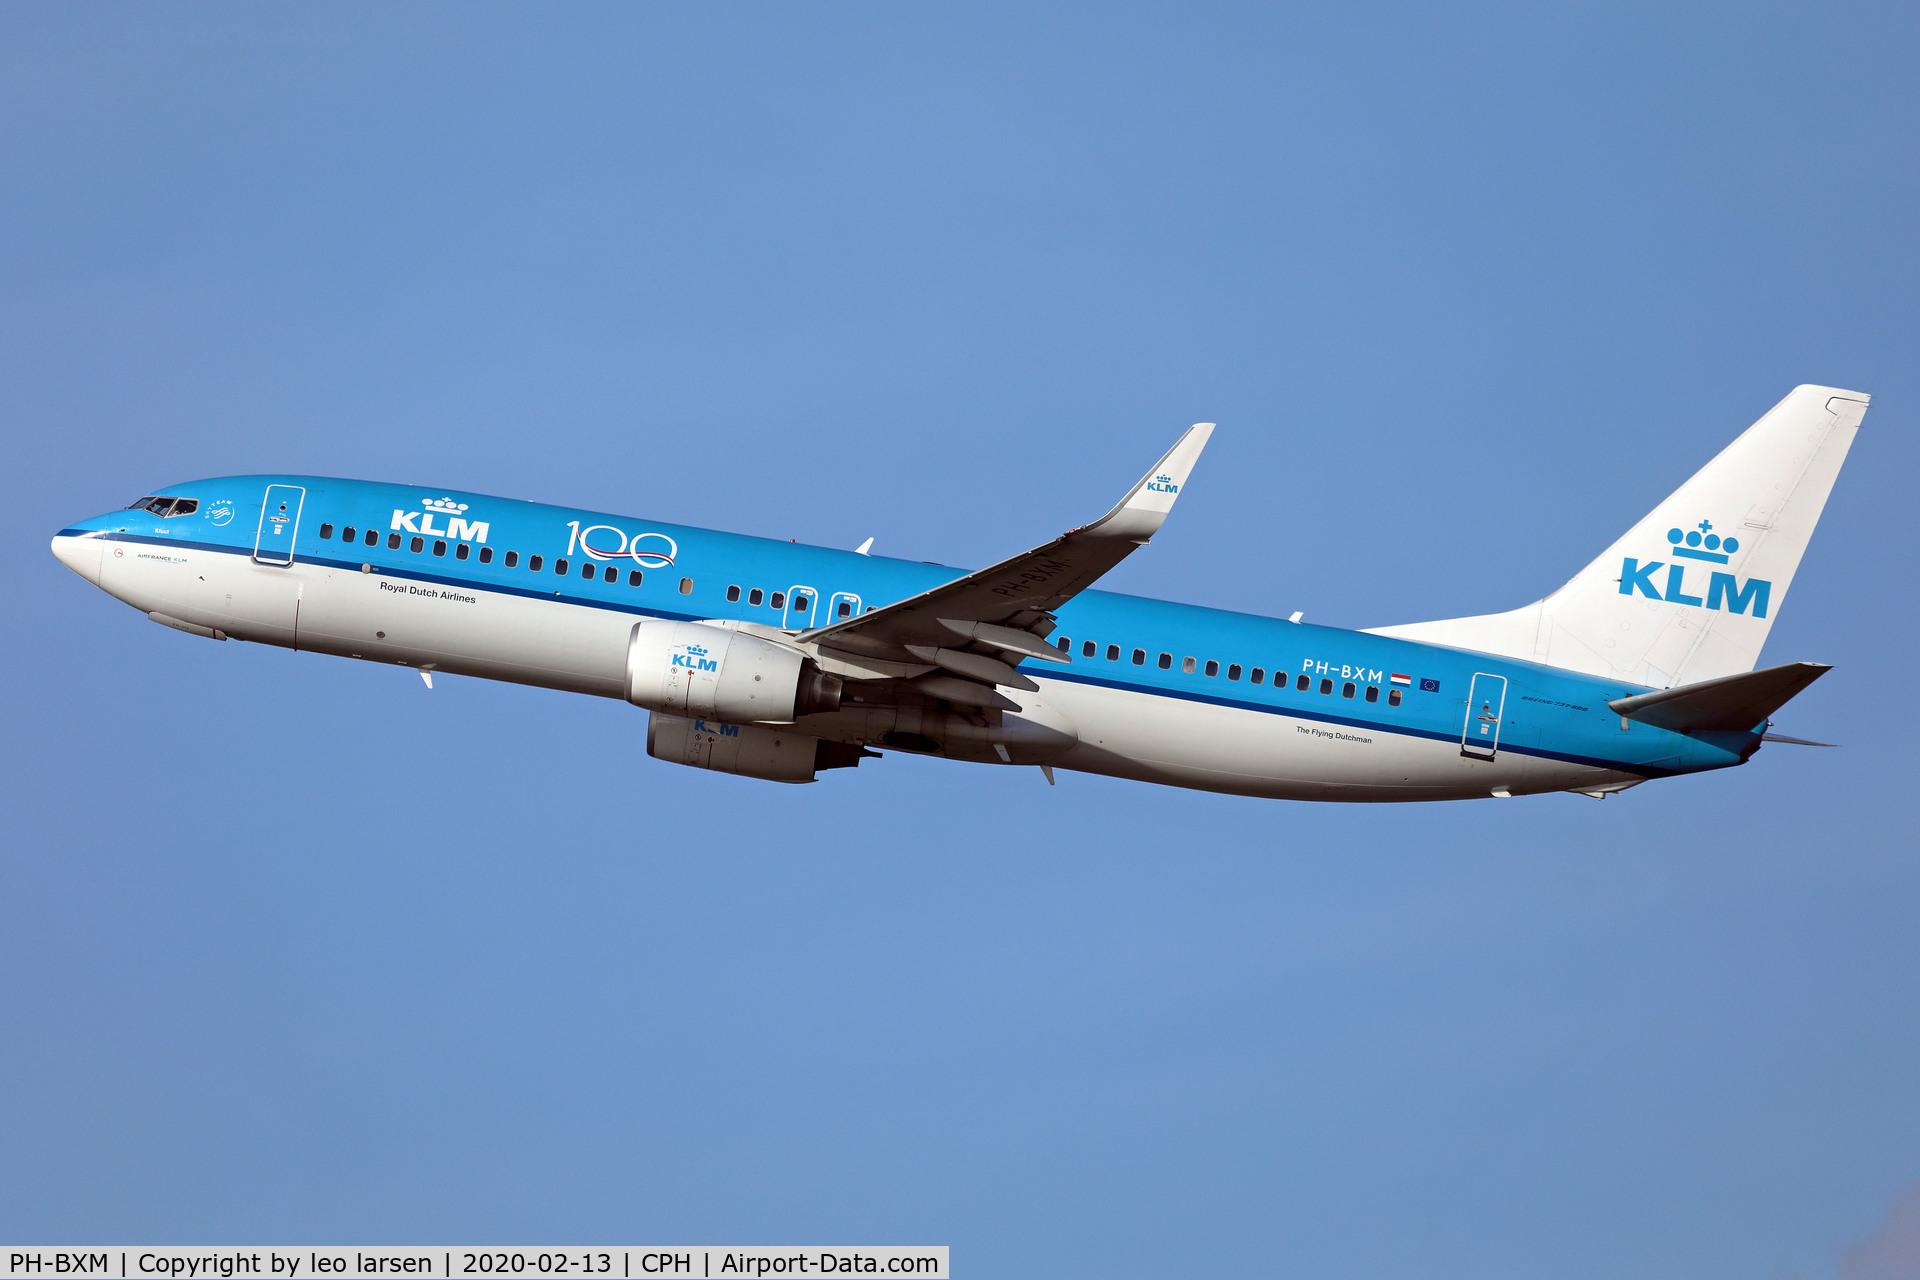 PH-BXM, 2000 Boeing 737-8K2 C/N 30355, Copenhagen 13.2.2020